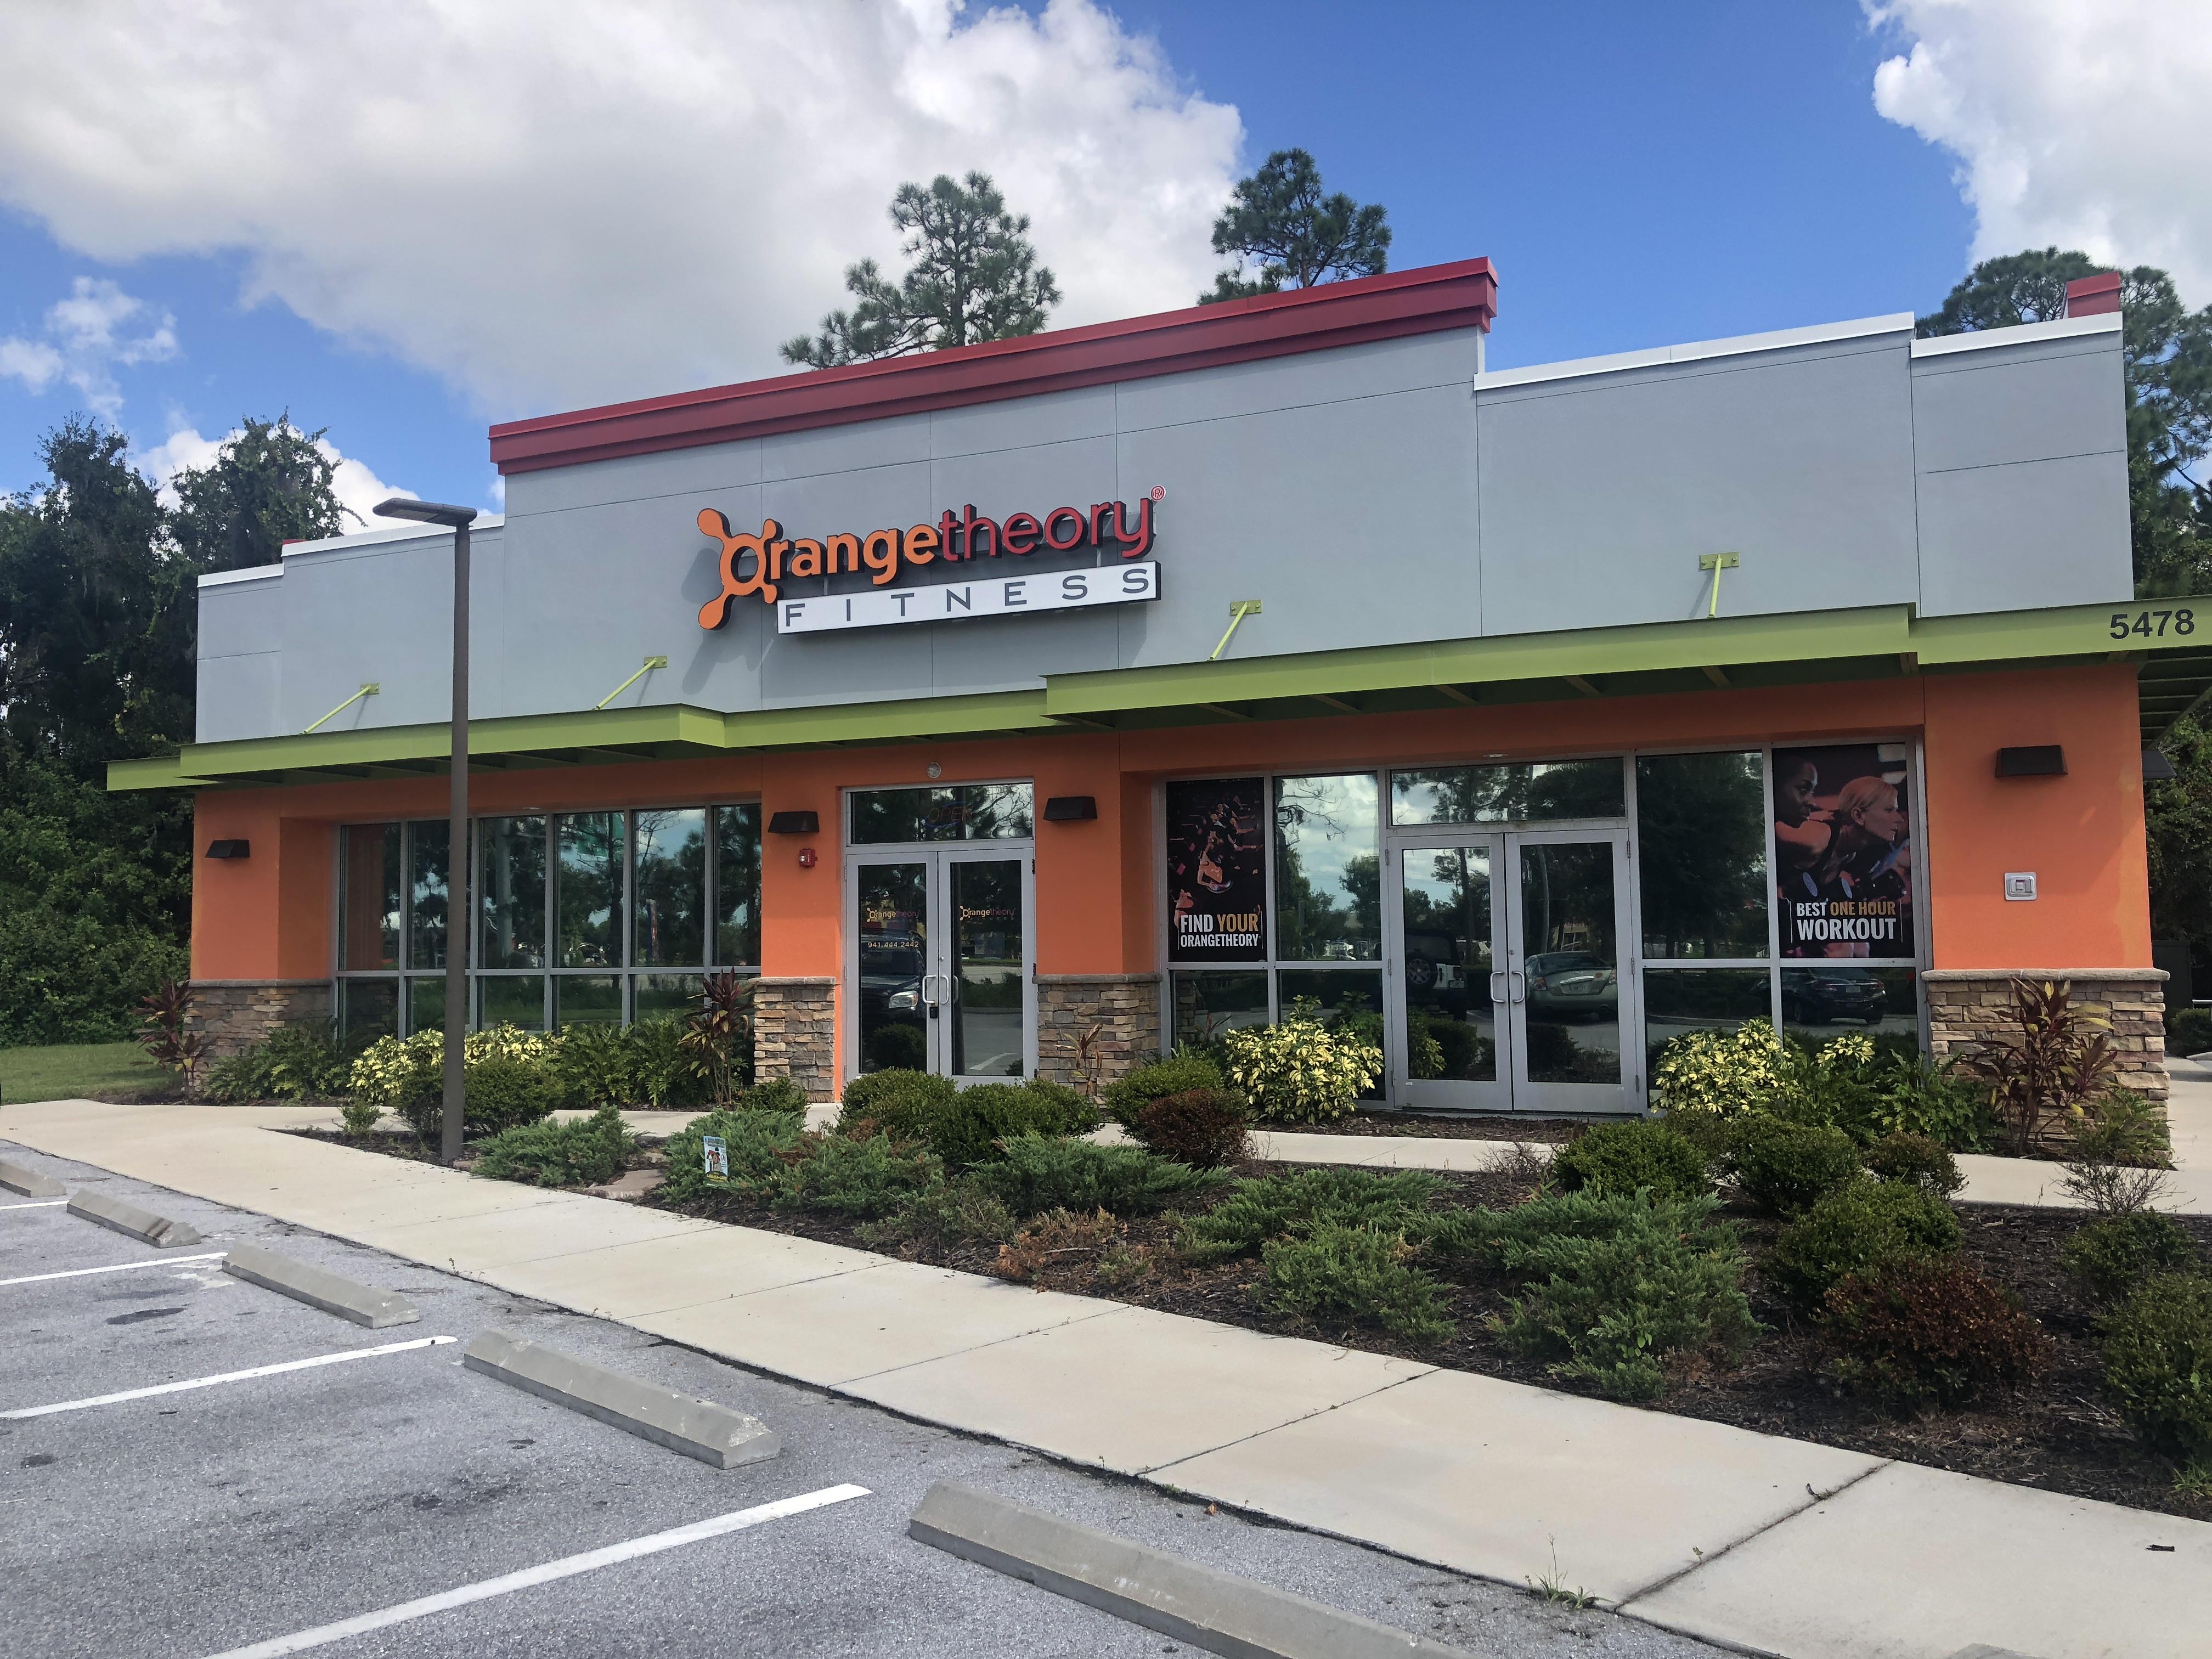 orangetheory fitness review – storefront